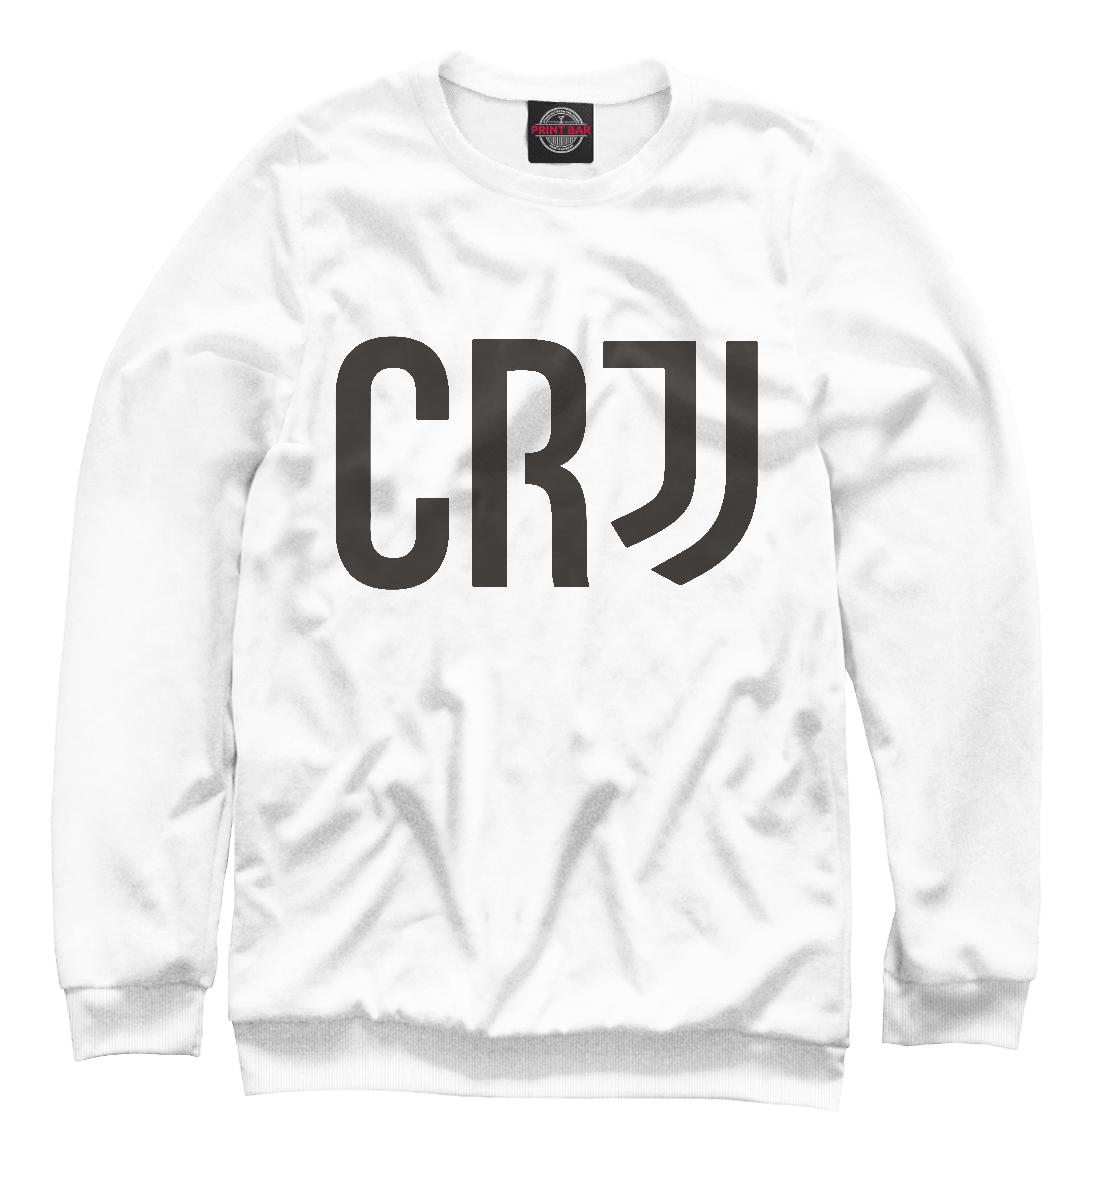 Купить Ronaldo - Juventus, Printbar, Свитшоты, JUV-686465-swi-1